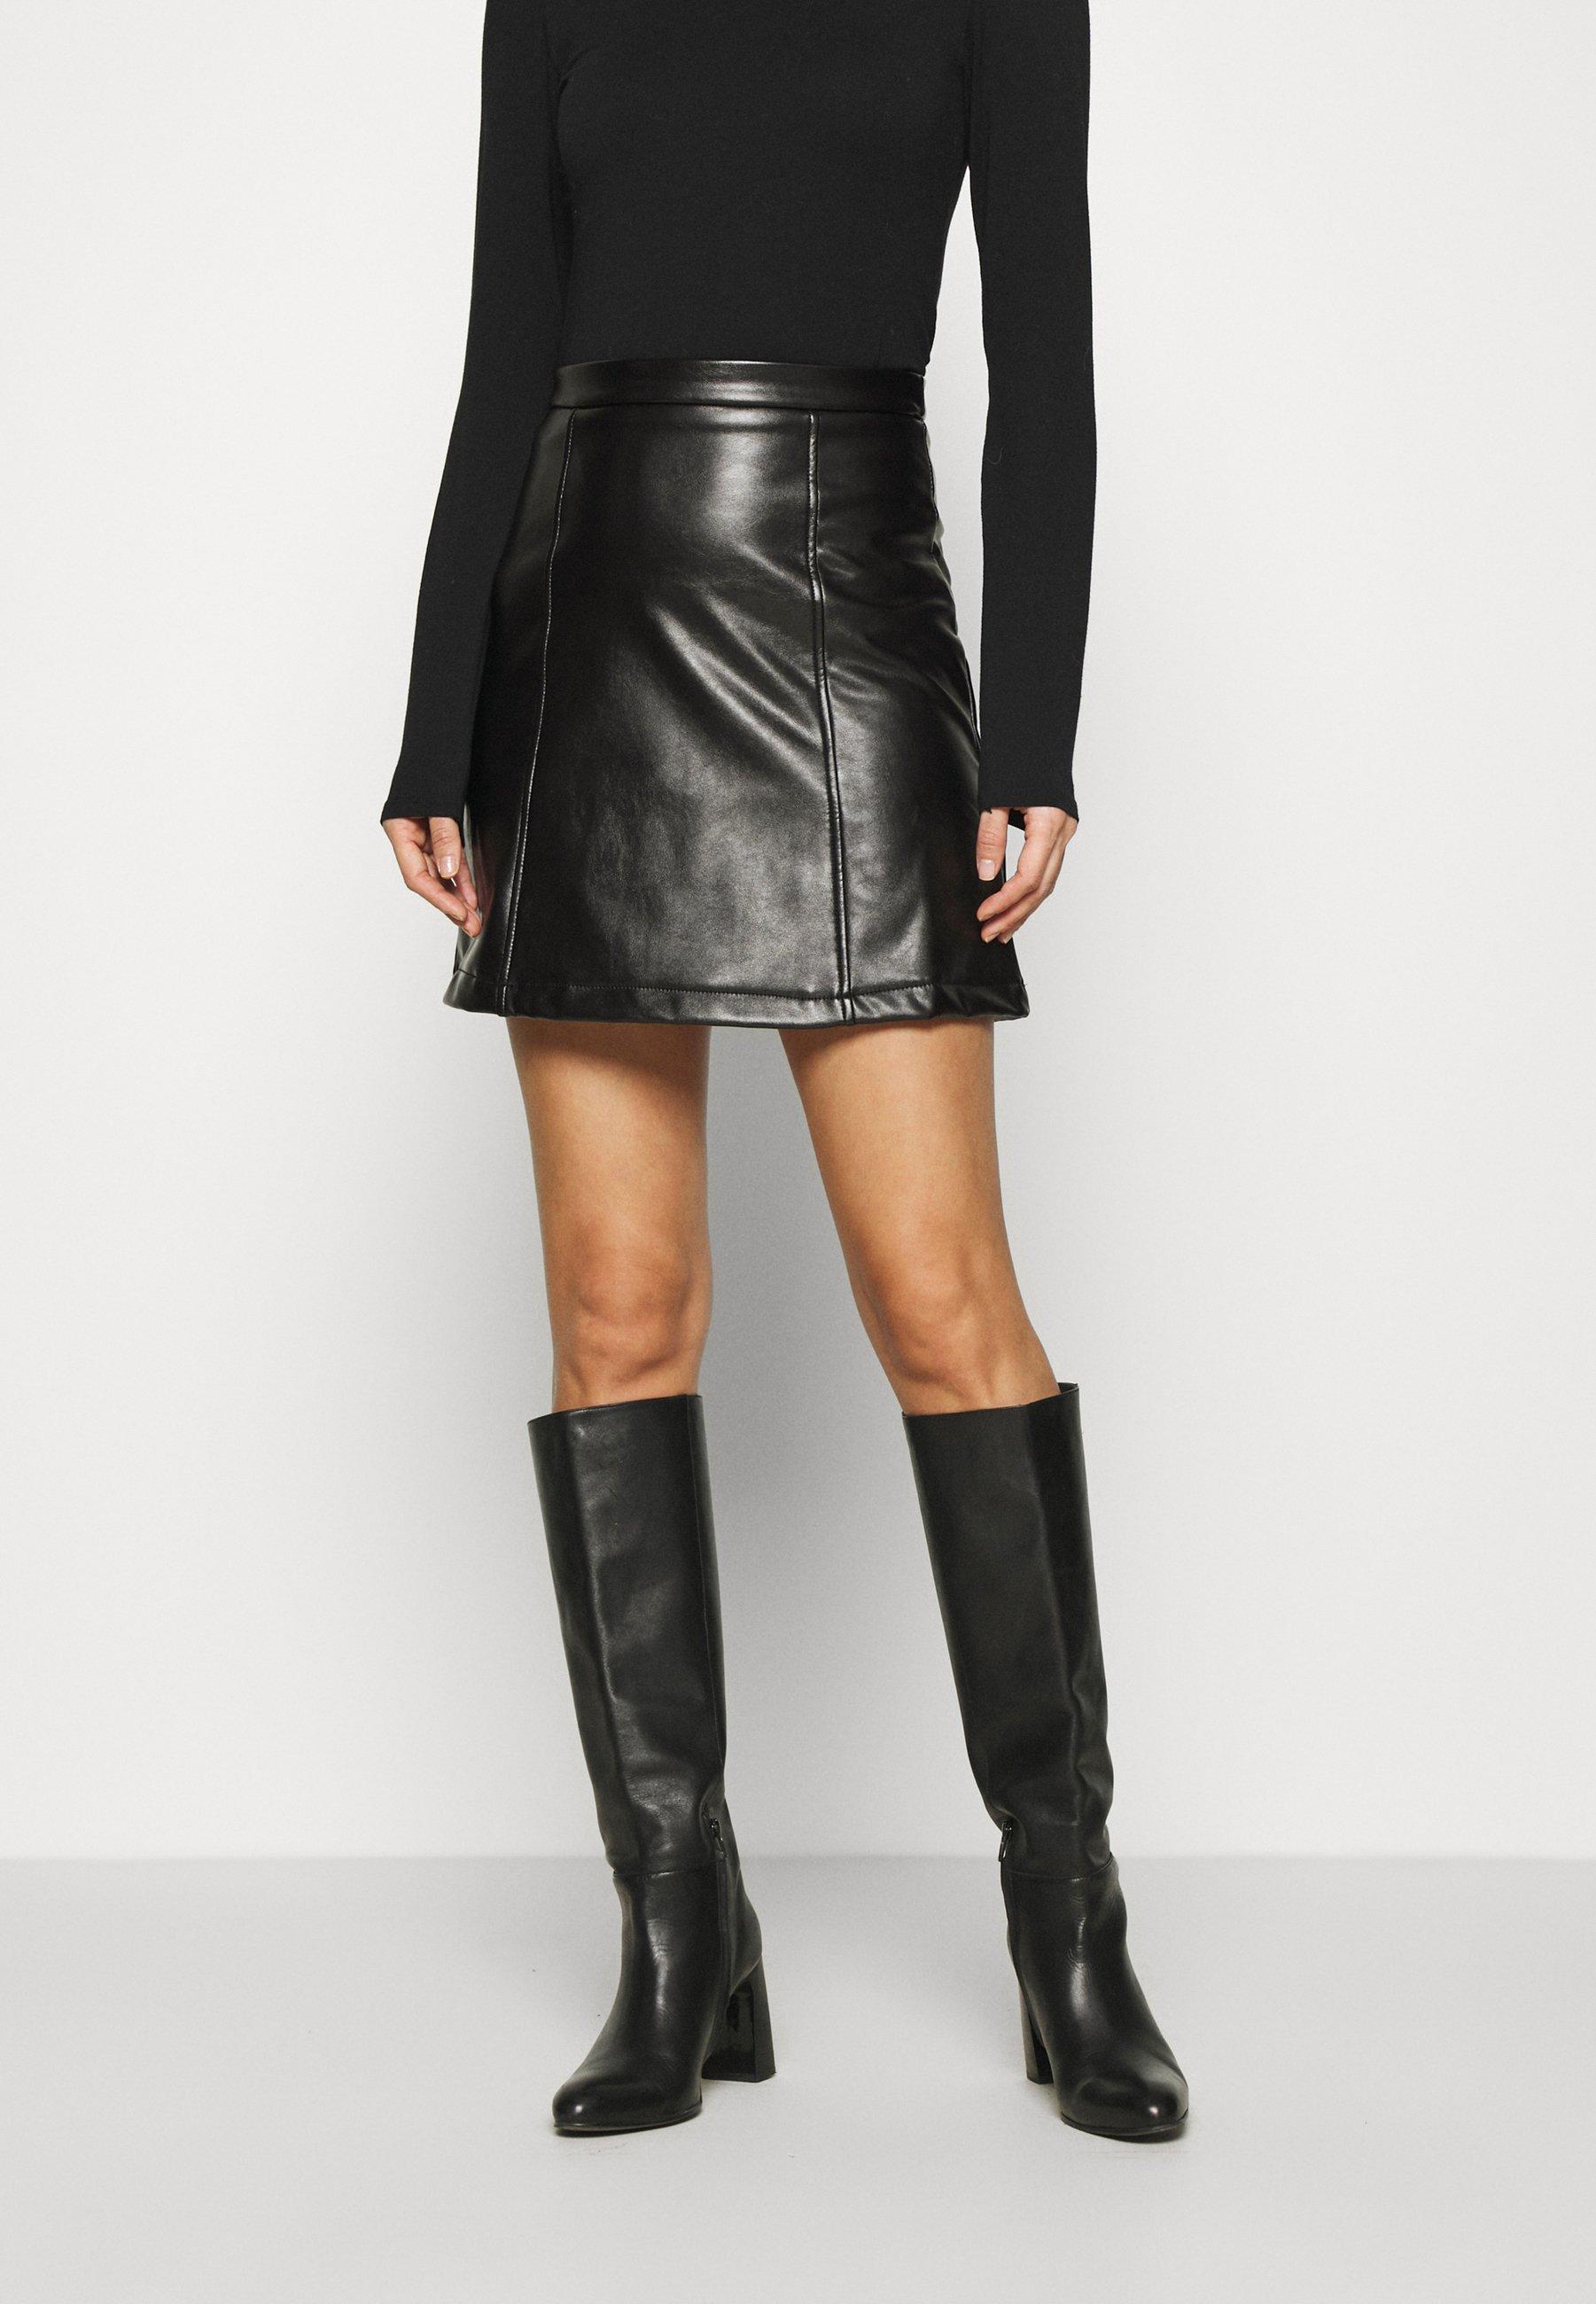 Femme PU leather mini skirt - Minijupe